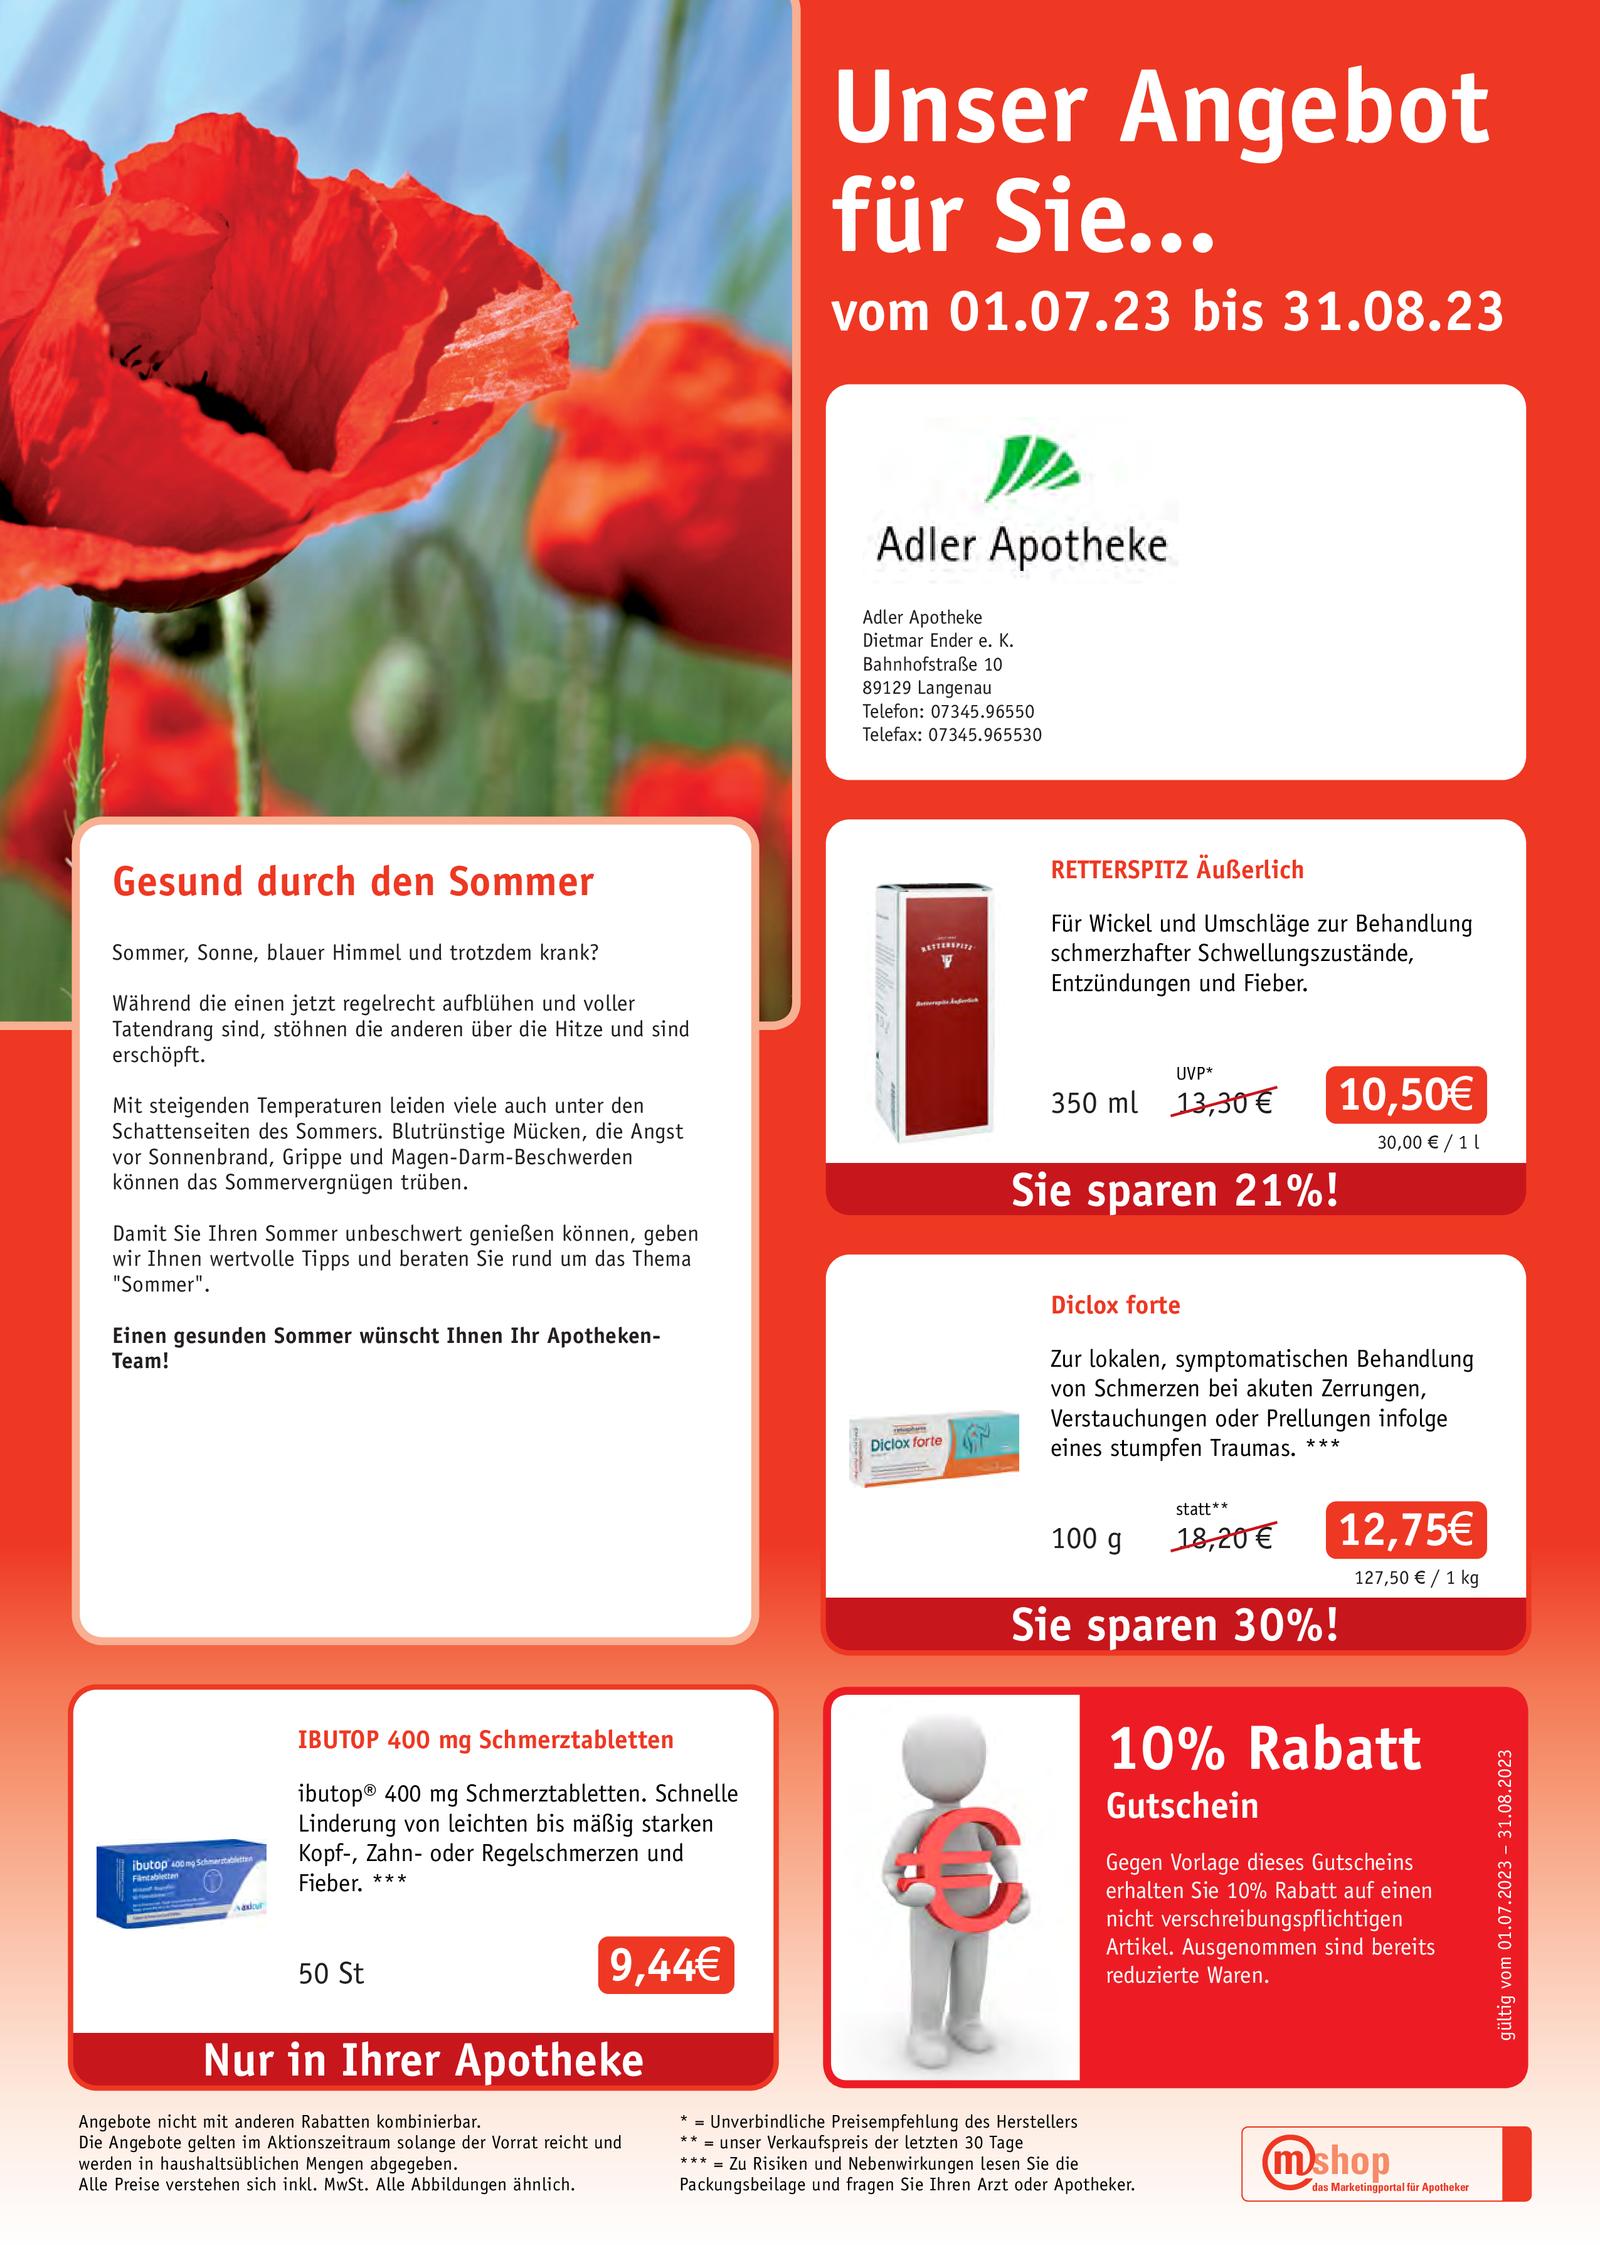 https://mein-uploads.apocdn.net/54/leaflets/54_flyer-Seite1.png